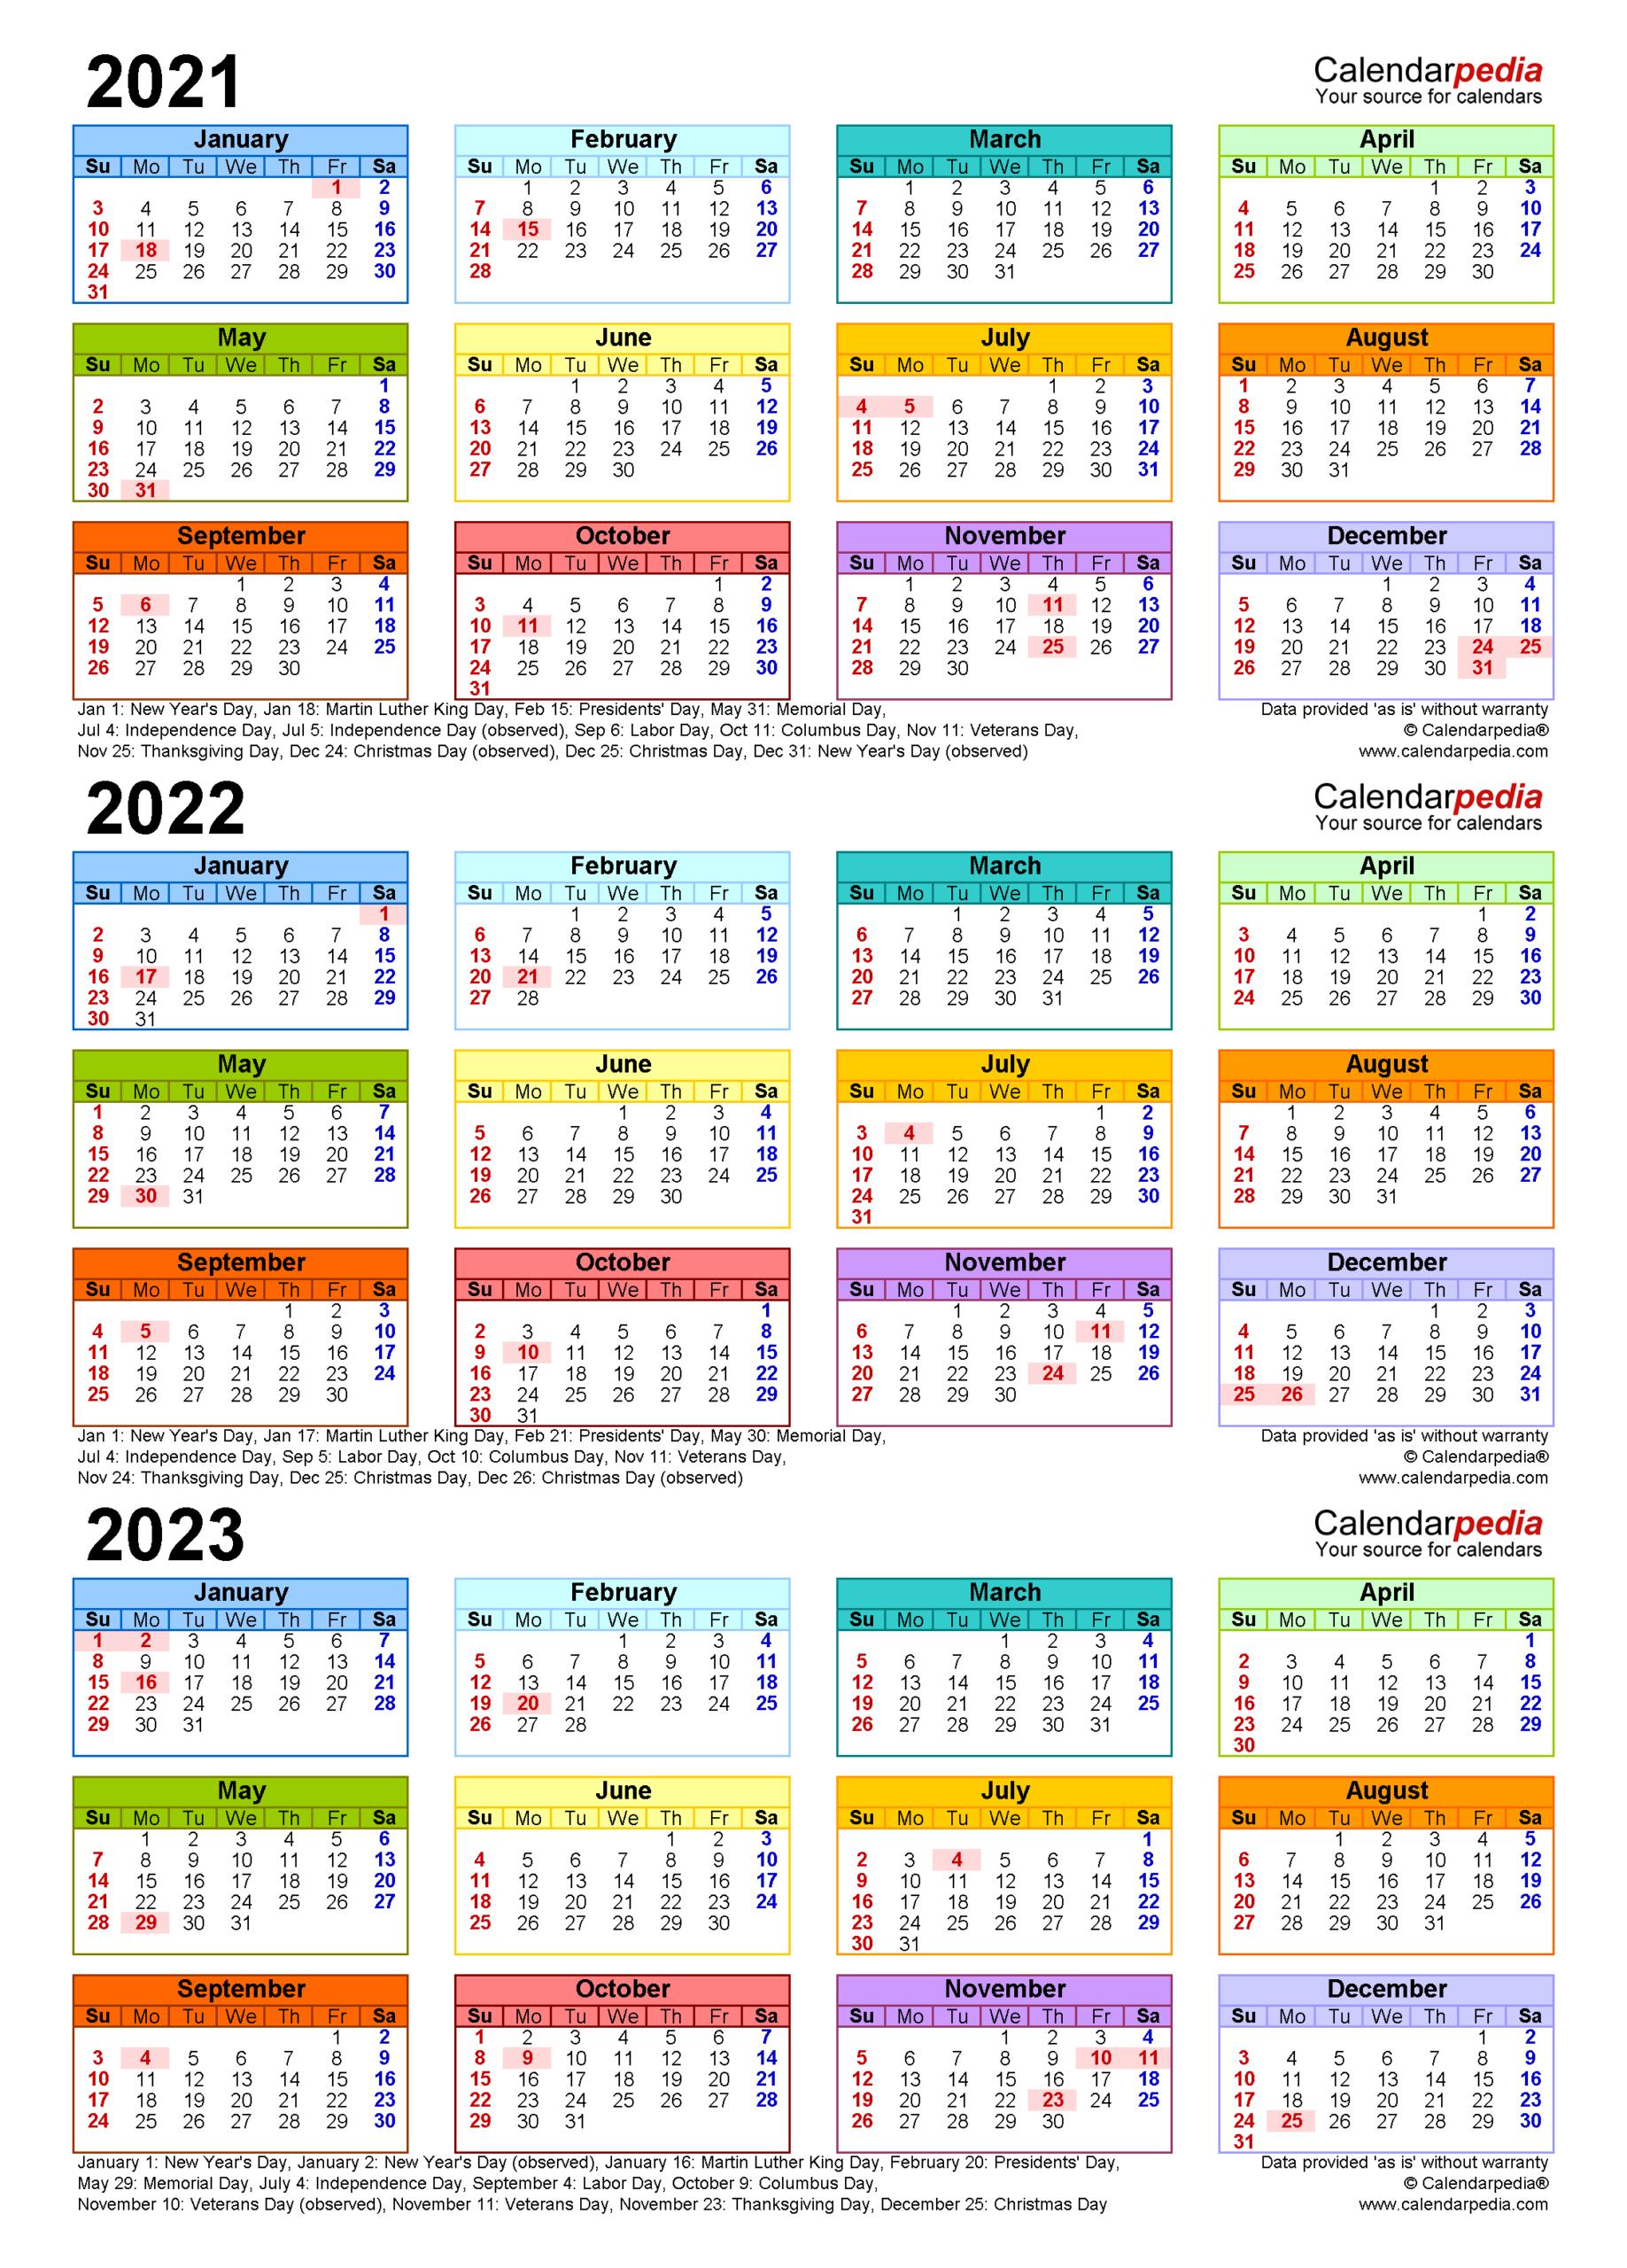 2021-2023 Three Year Calendar - Free Printable Word Templates with regard to Three Year Printable Calendar 2021 To 2023